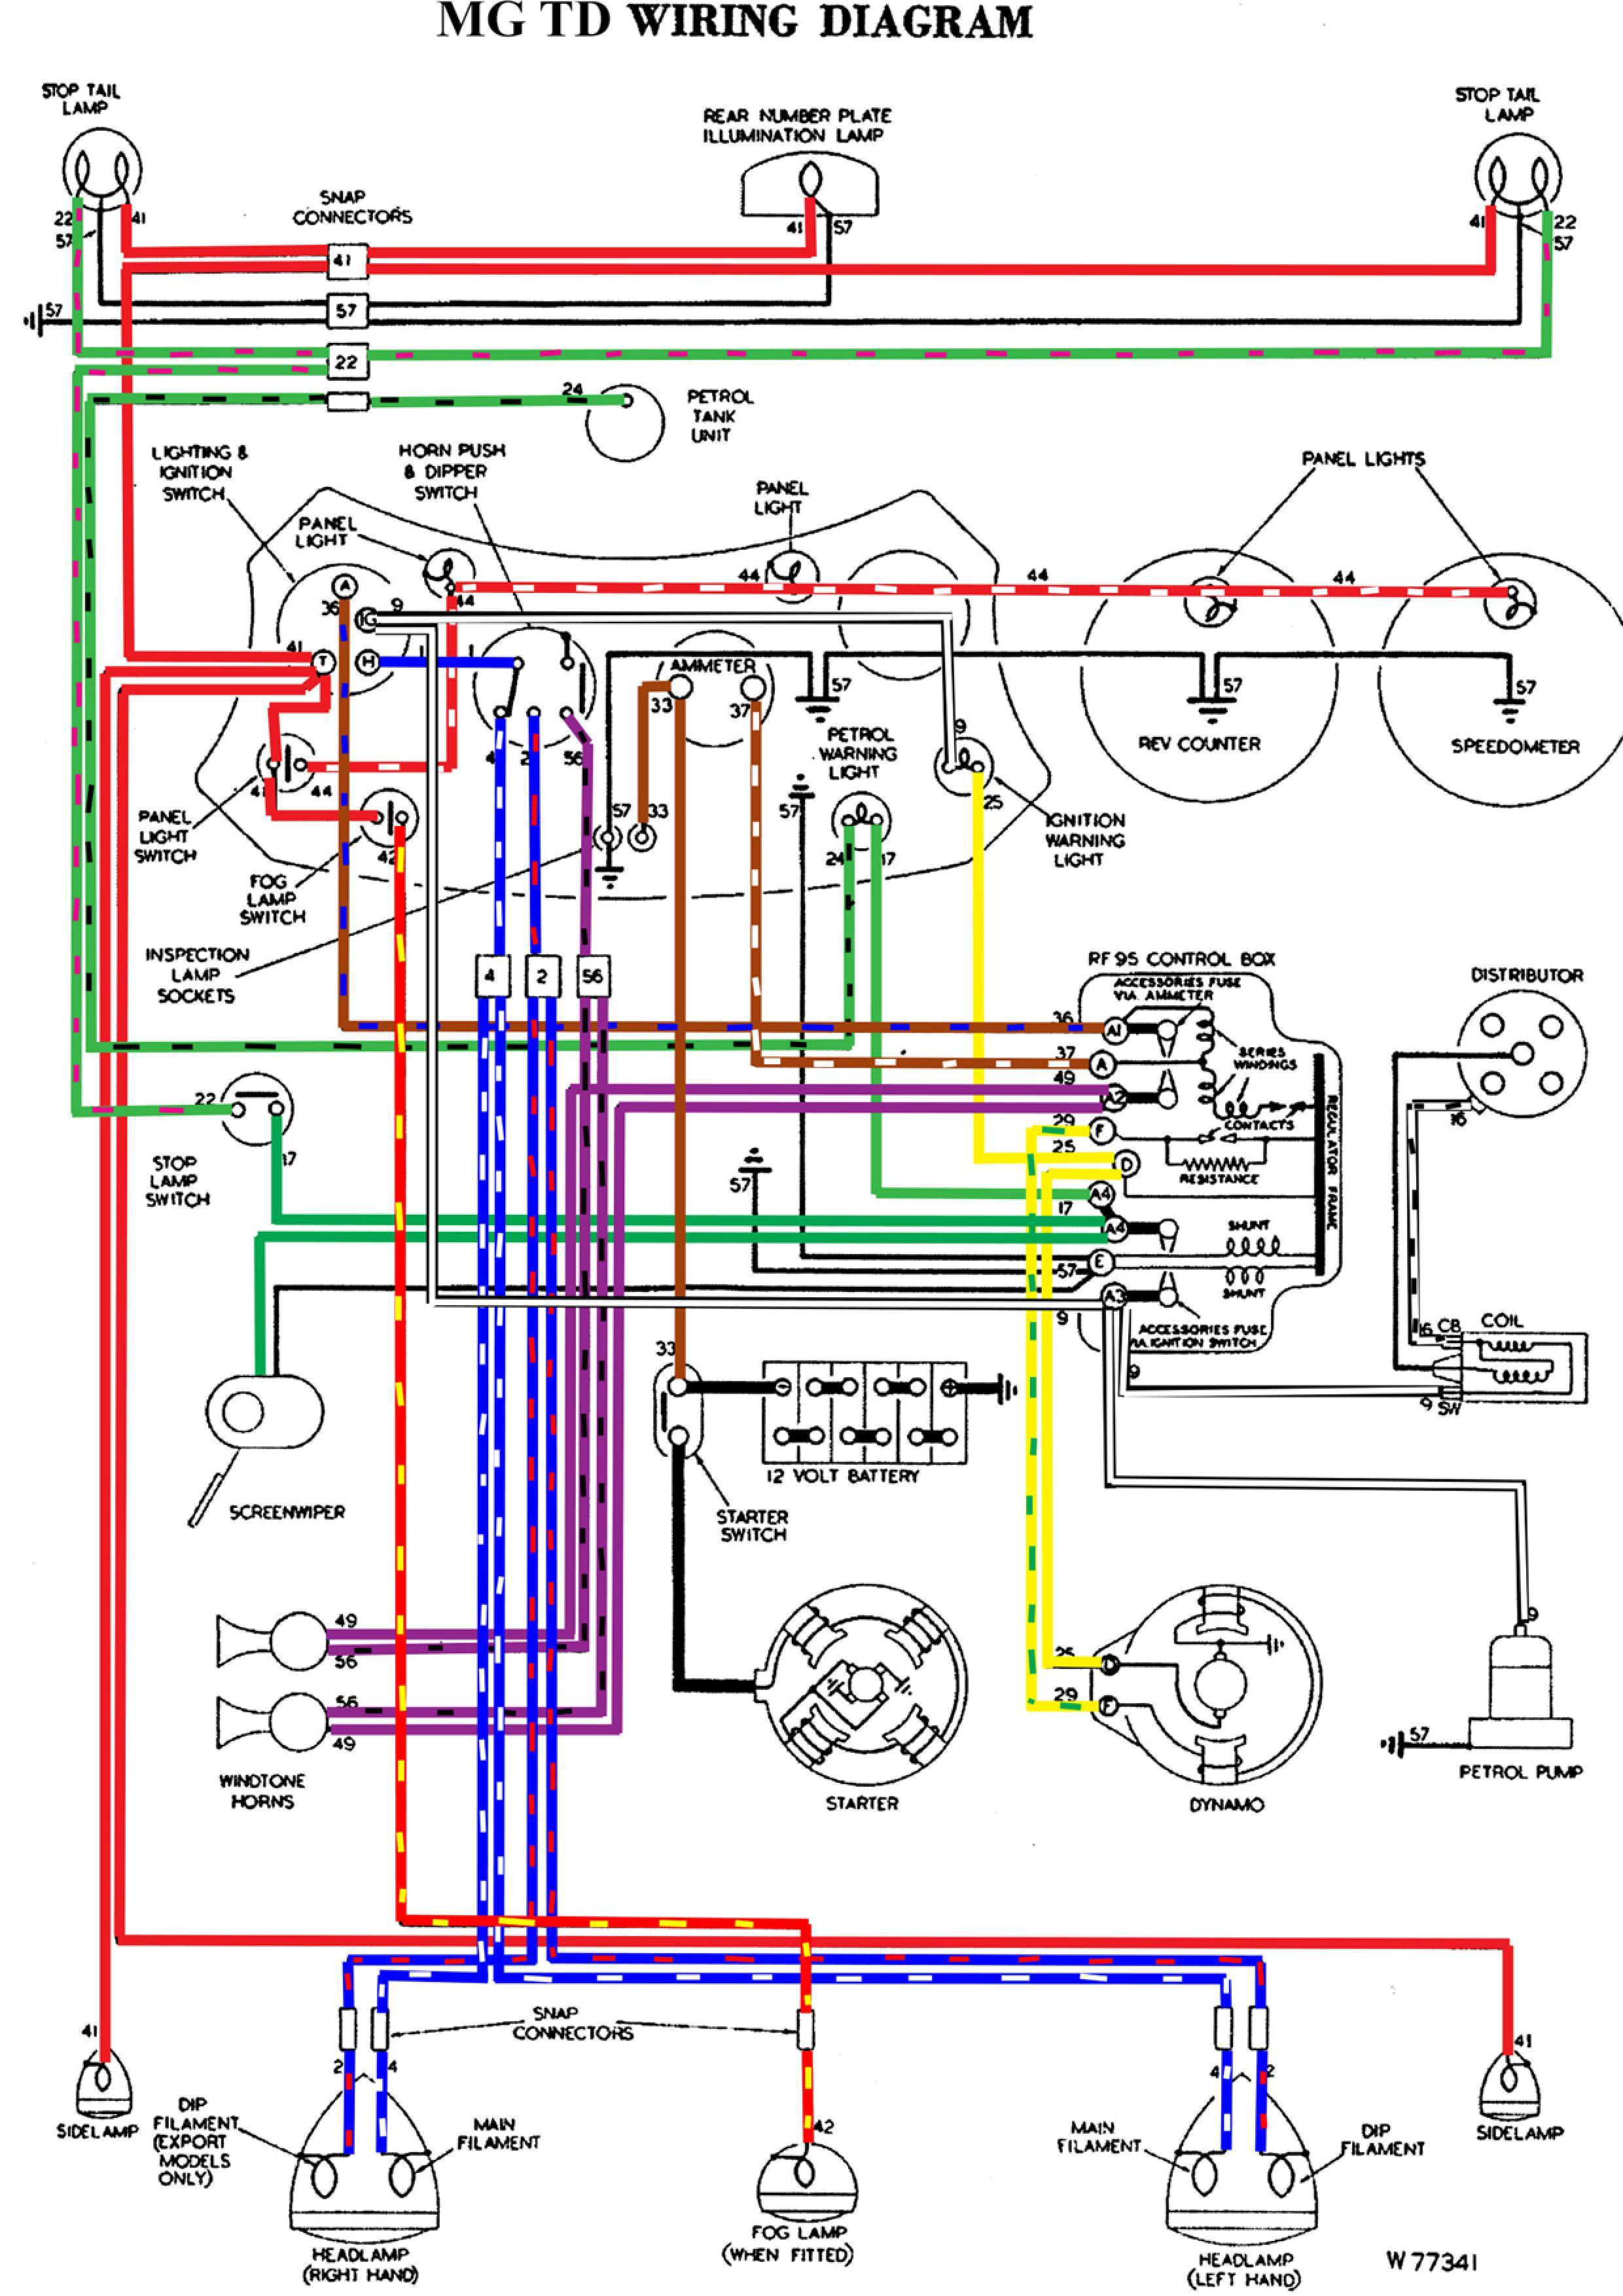 SY_2188] 1979 Mg Midget Brake Light Switch Wiring Harness Wiring Diagram  Download DiagramOphag Numap Mohammedshrine Librar Wiring 101